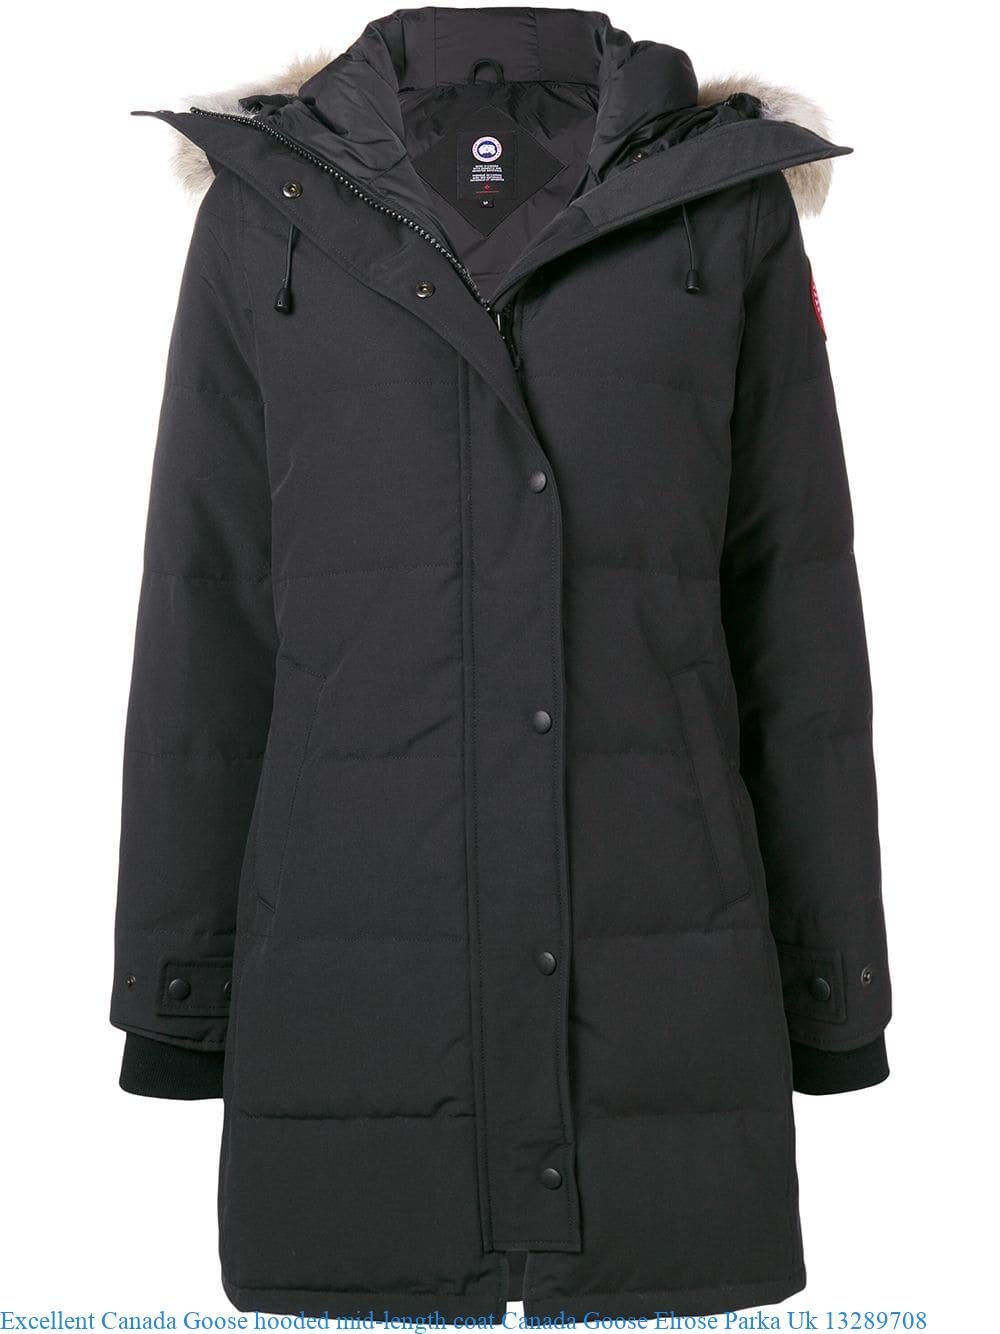 20ea90d8c Excellent Canada Goose hooded mid-length coat Canada Goose Elrose ...